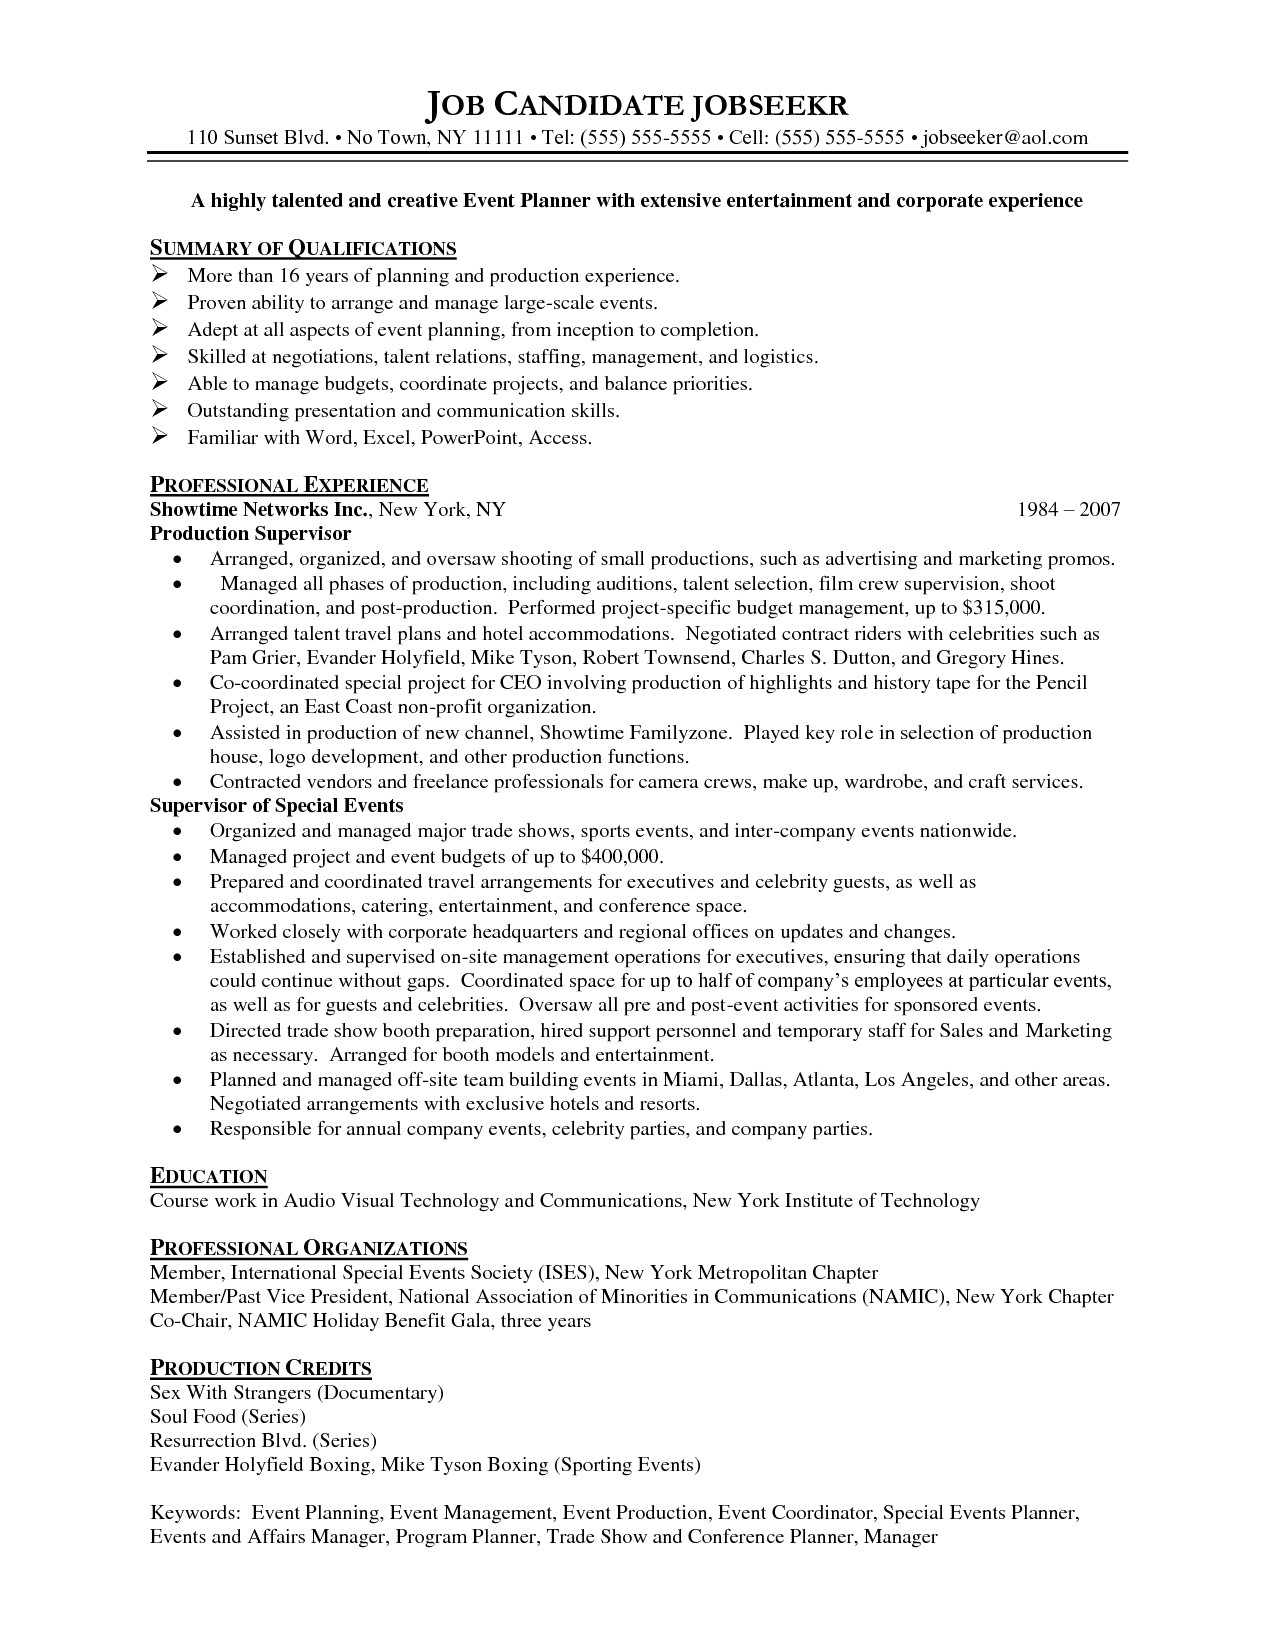 professional organizer resume sample